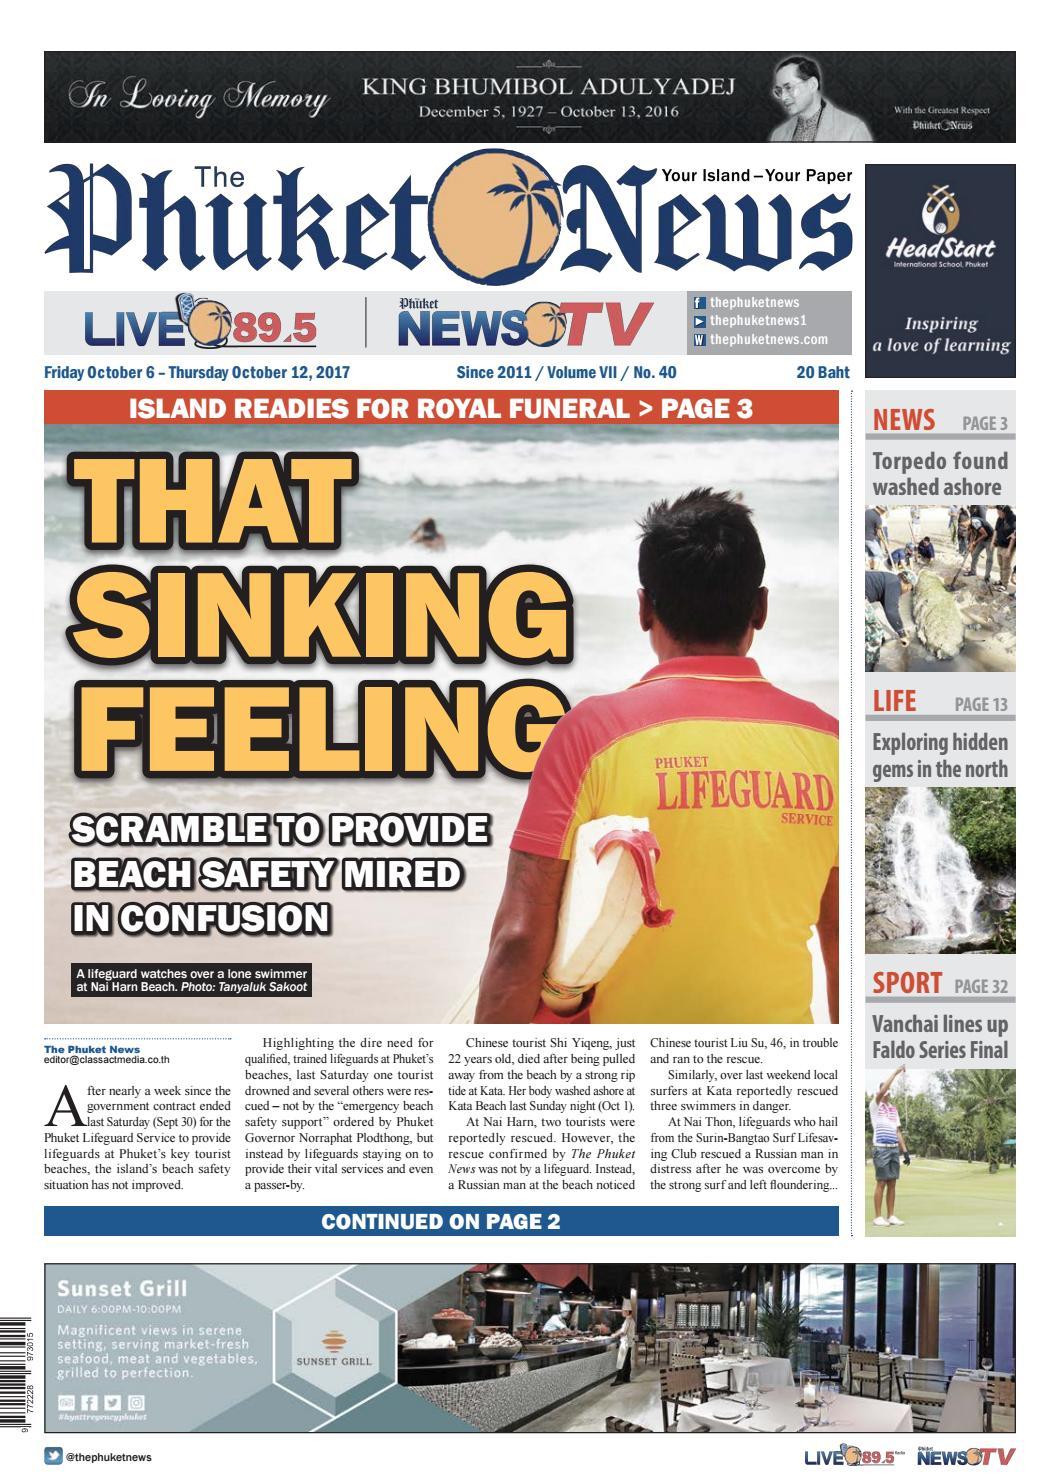 0c7fcc574047 06-10-2017 by The Phuket News - issuu